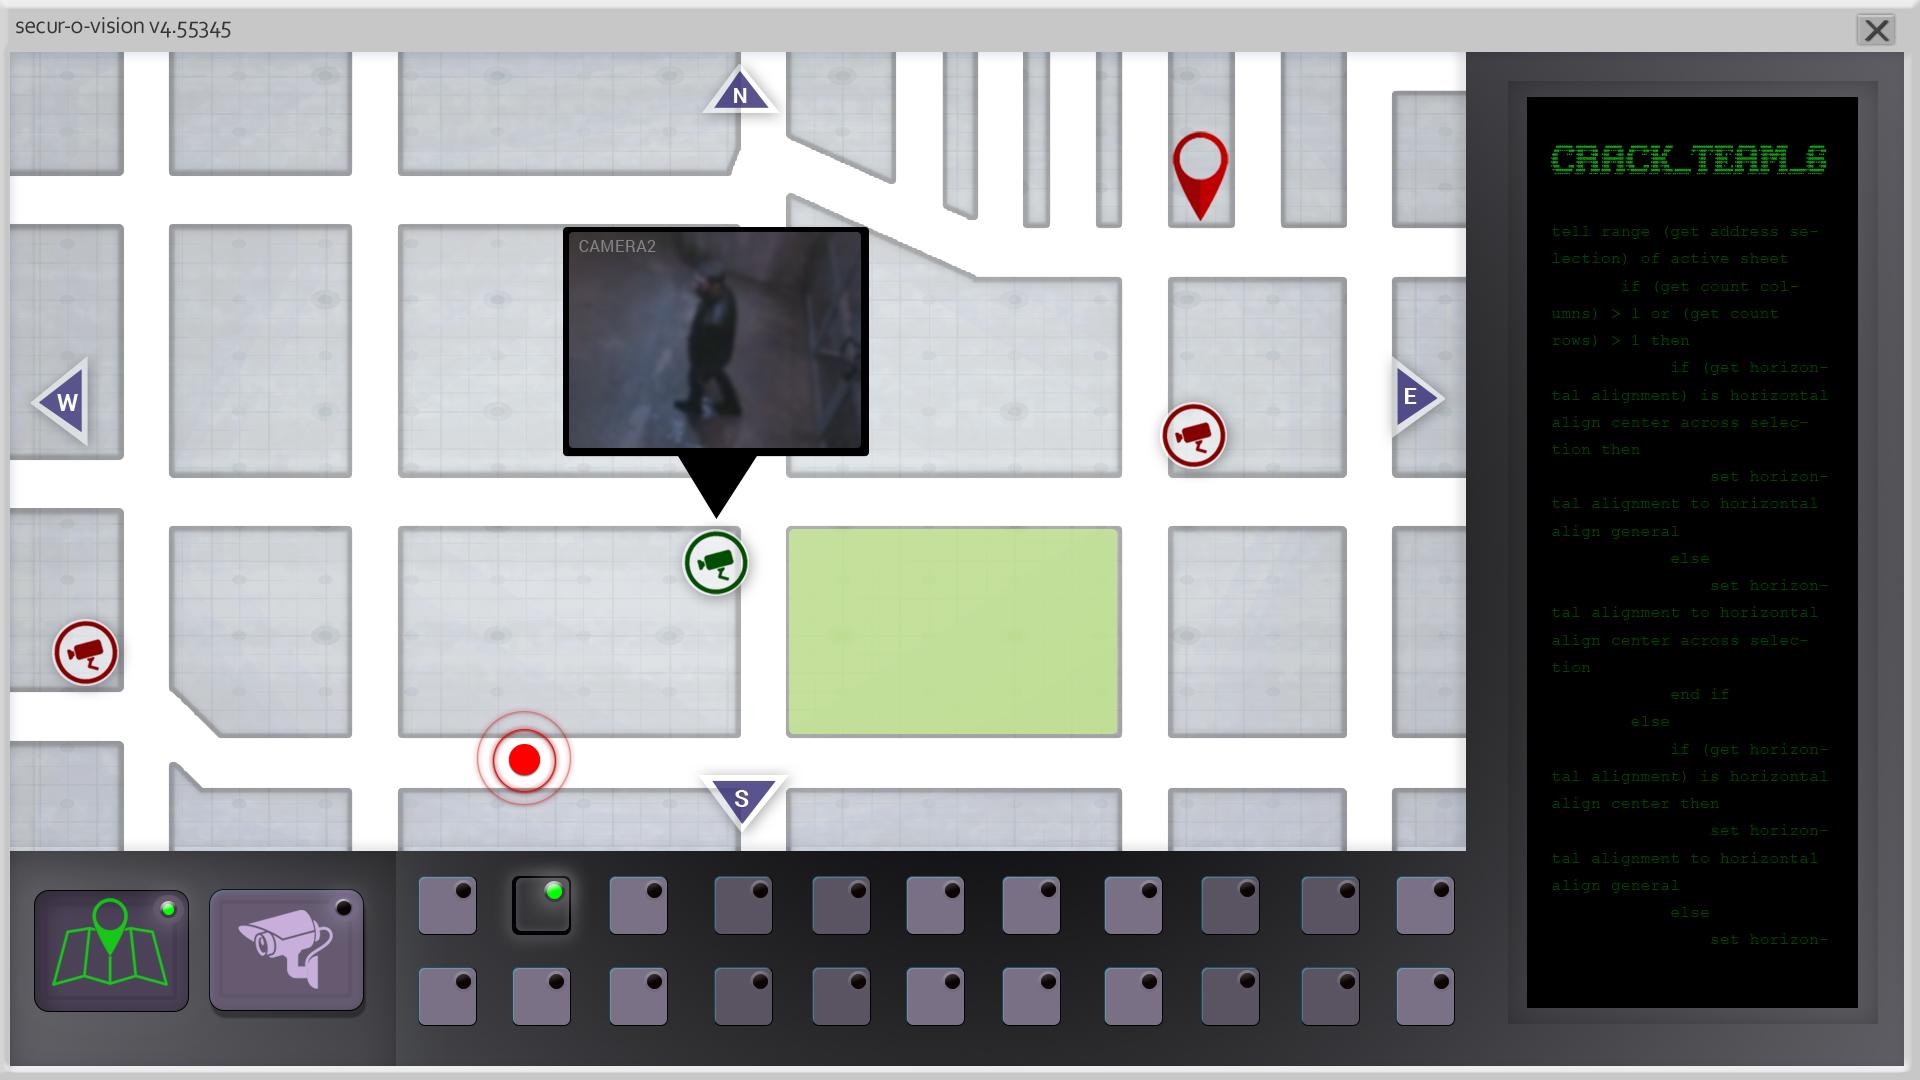 cctv+map_app_updated_march23.jpg